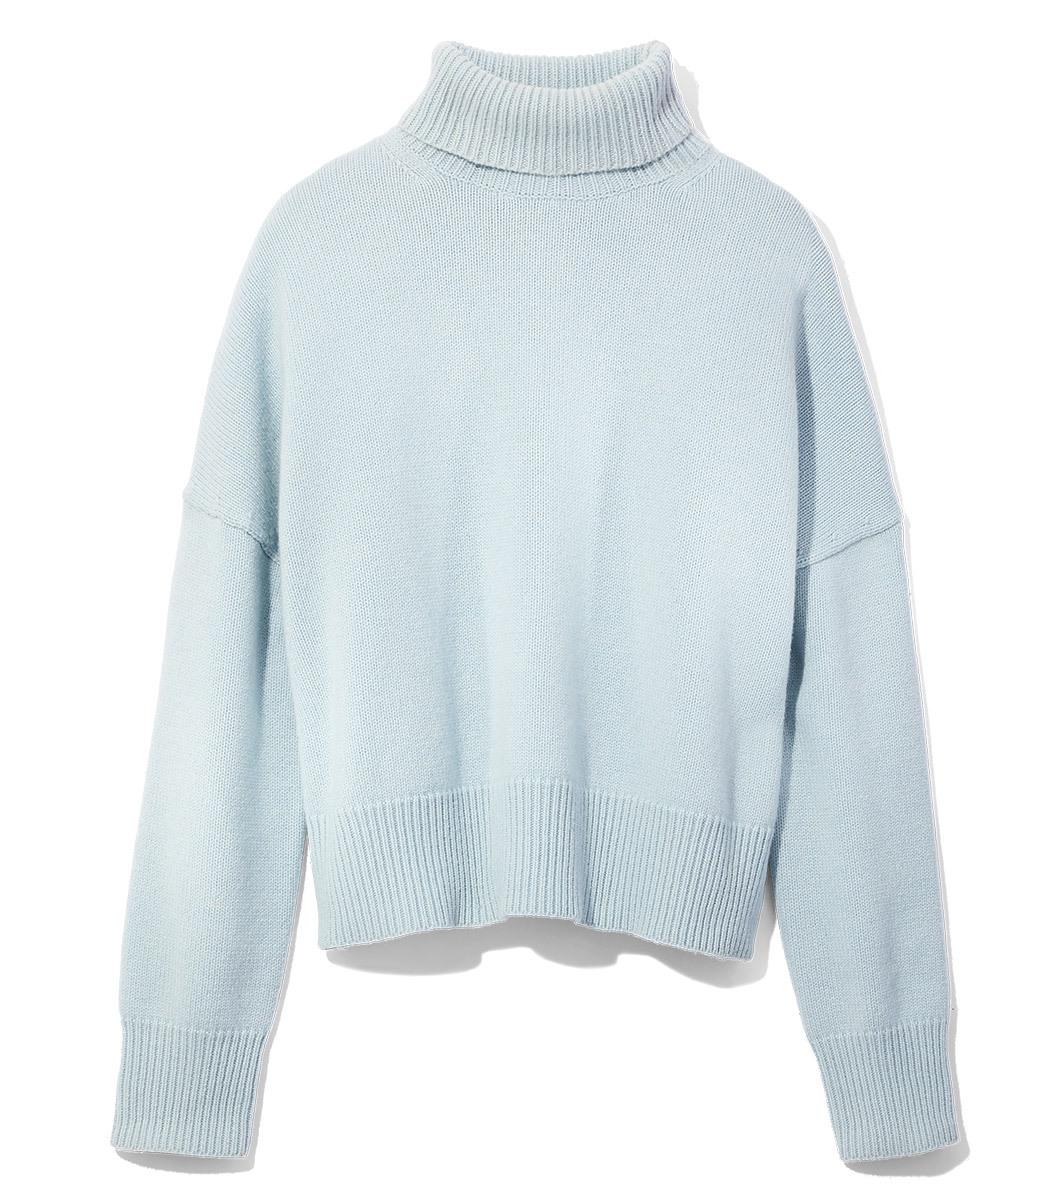 Nili Lotan Light Blue Turtleneck Sweater - Light Blue Turtleneck ...